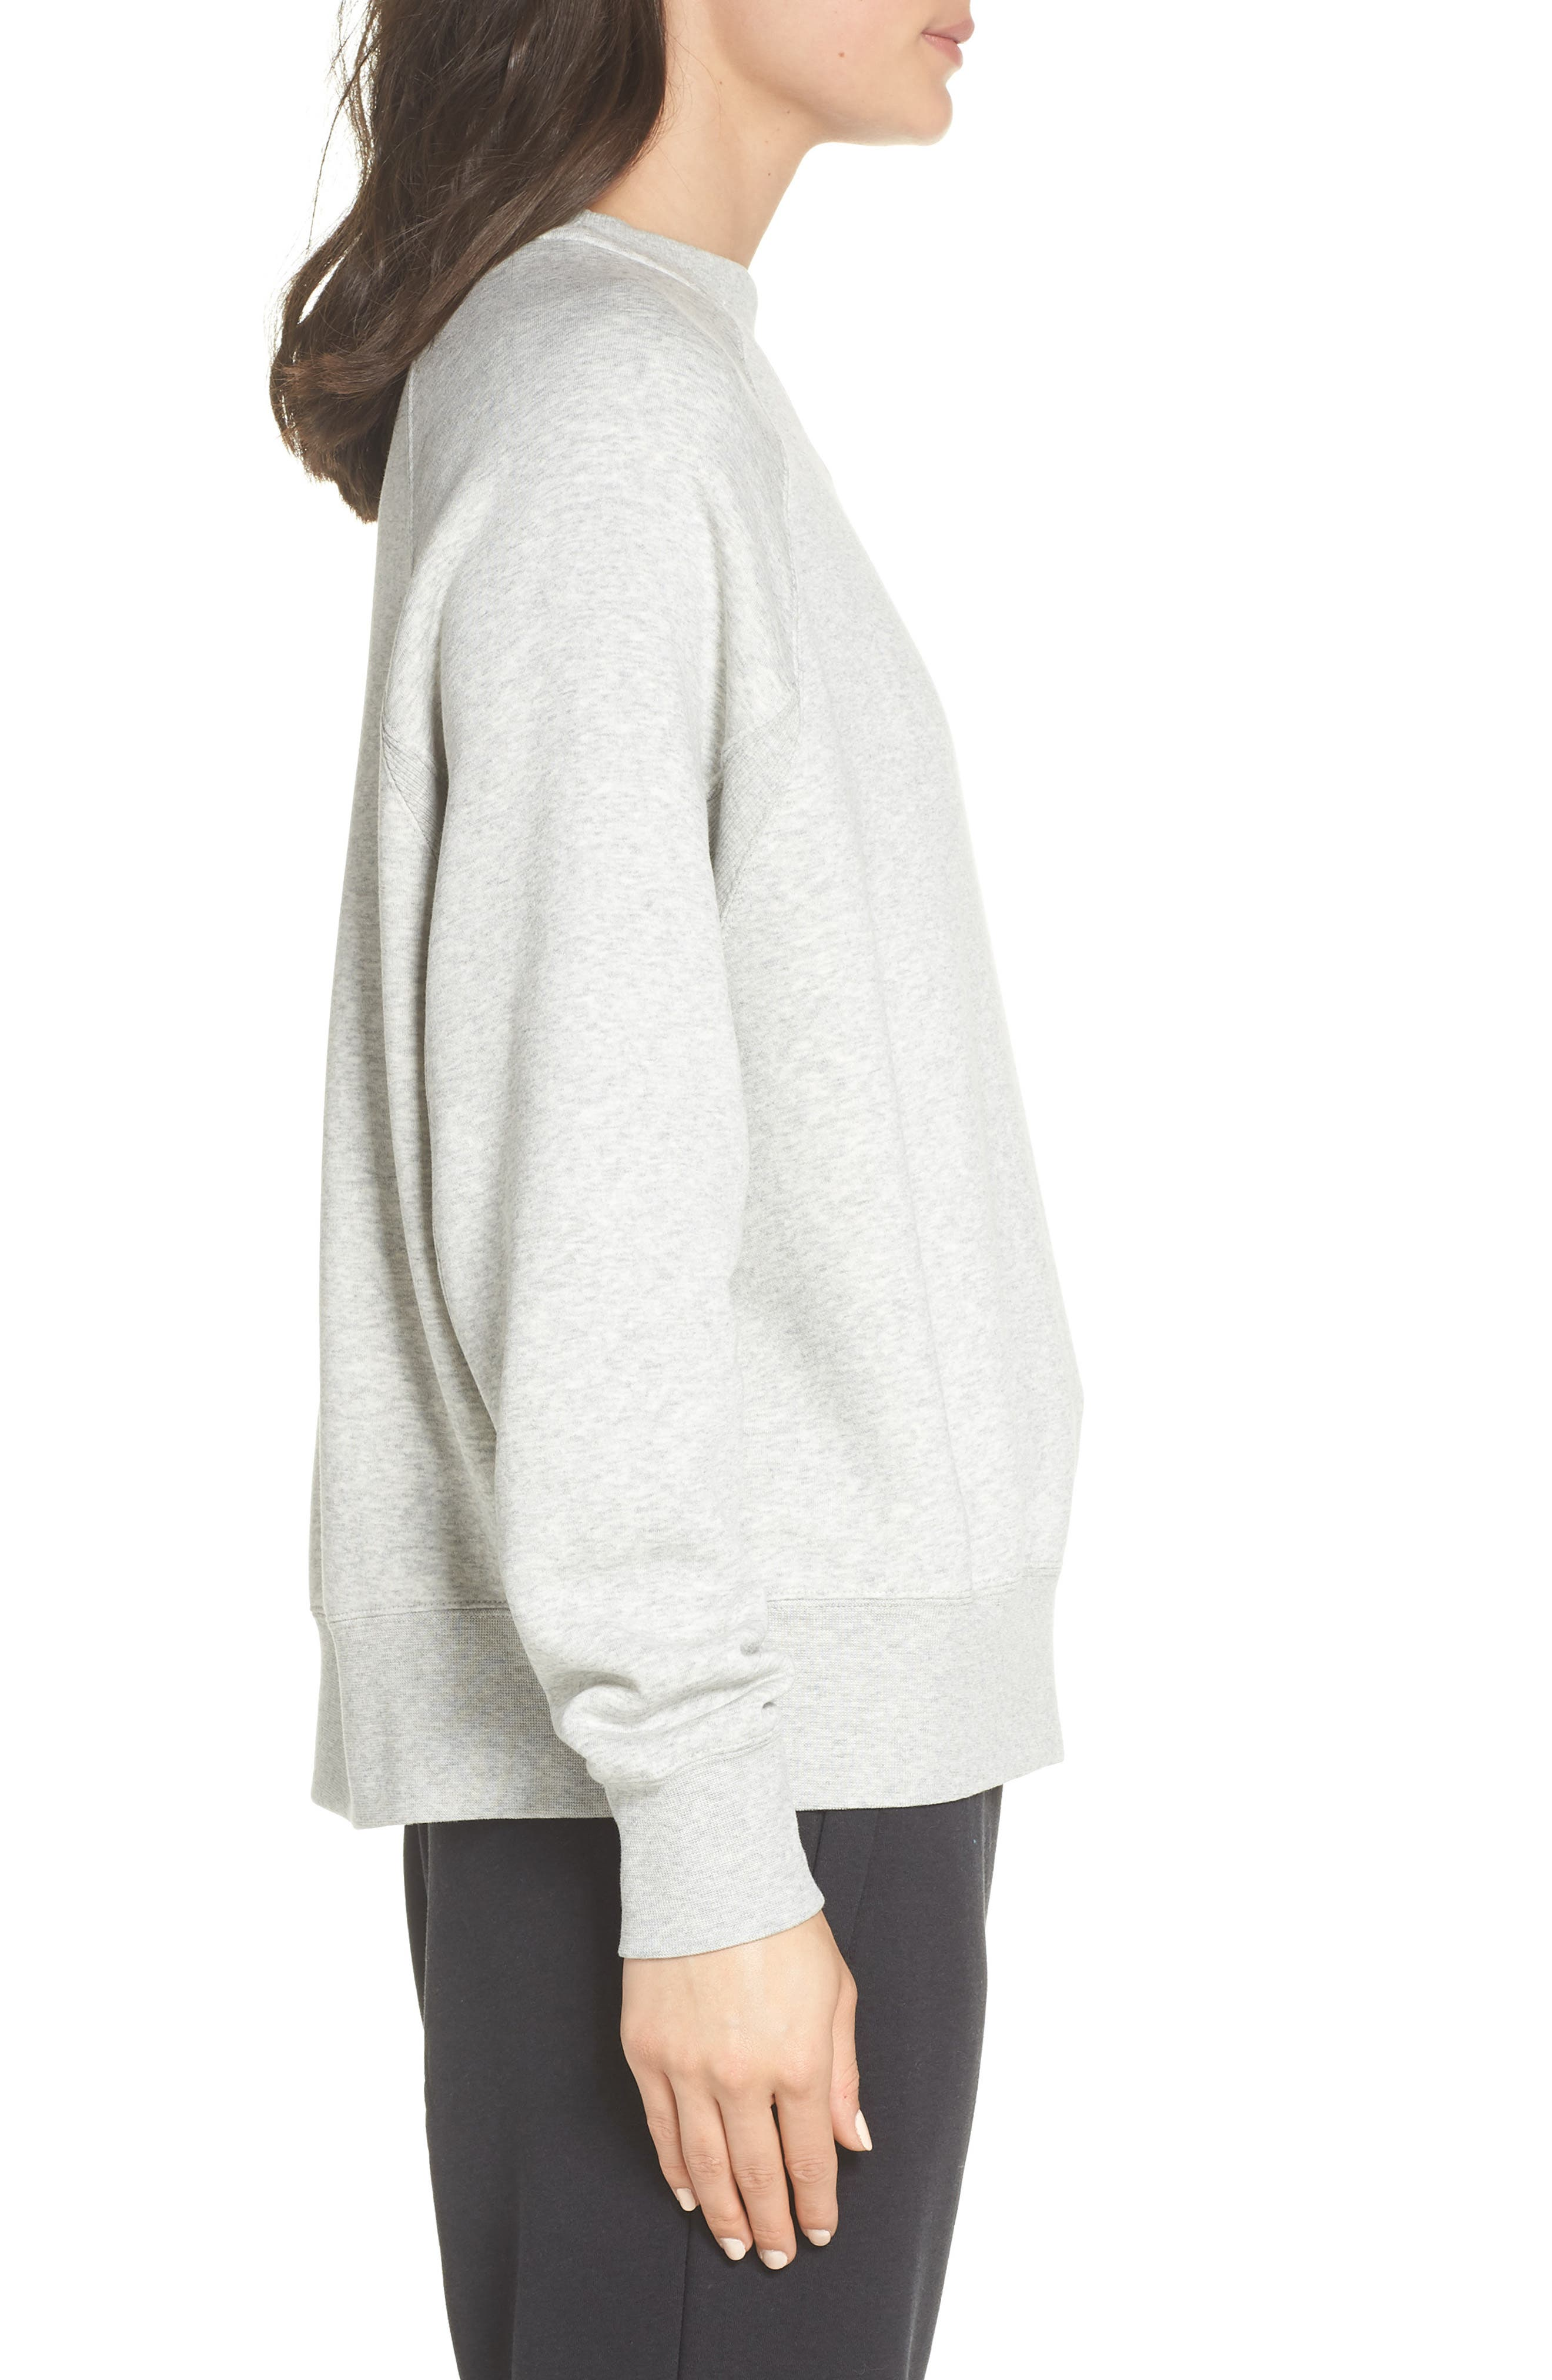 Sportswear Rally Sweatshirt,                             Alternate thumbnail 3, color,                             GREY HEATHER/ WHITE